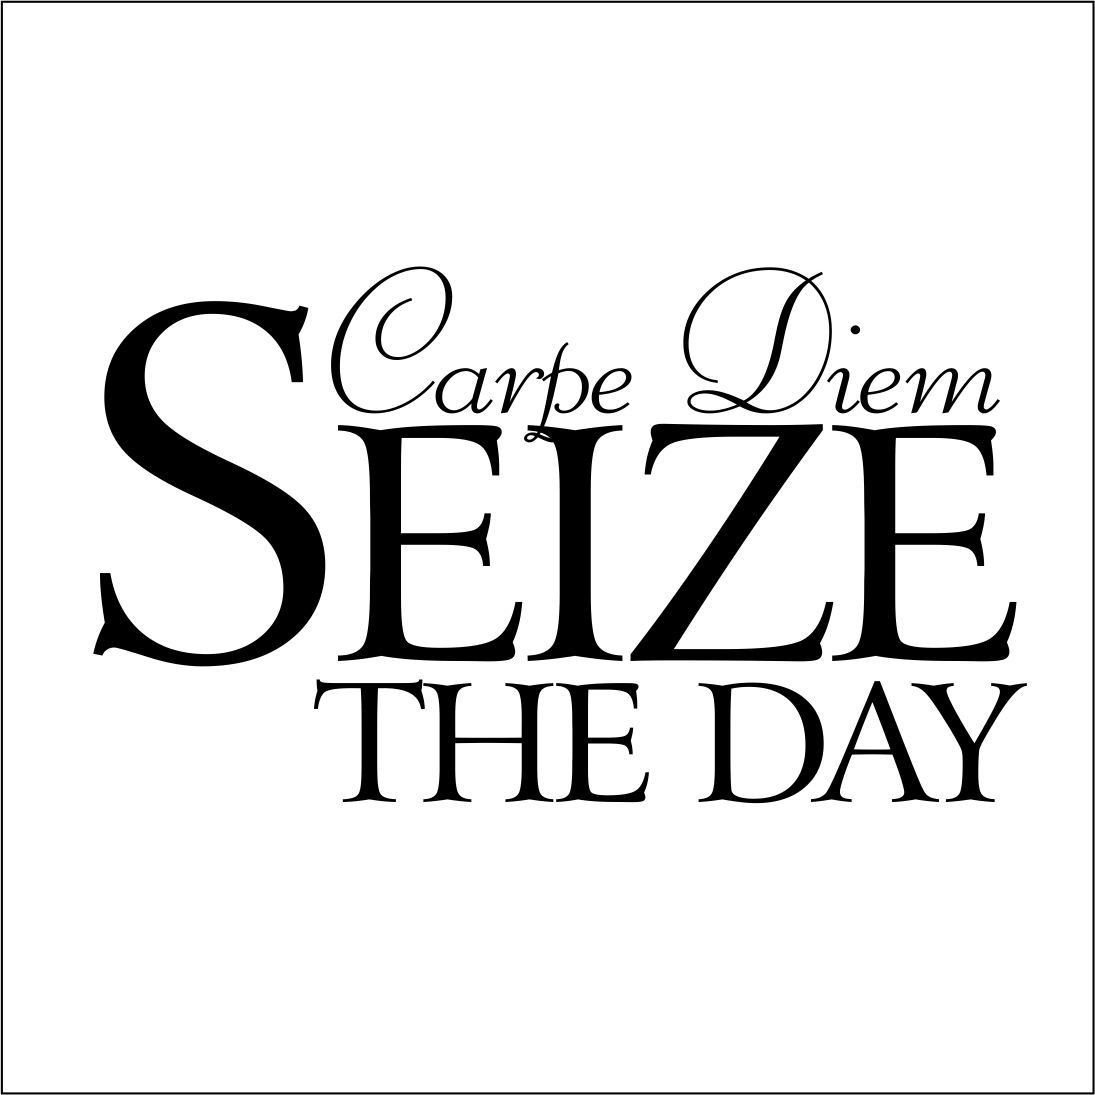 Carpe Diem Seize The Day Latin Quotes Inspirational Quotes Motivation Carpe Diem